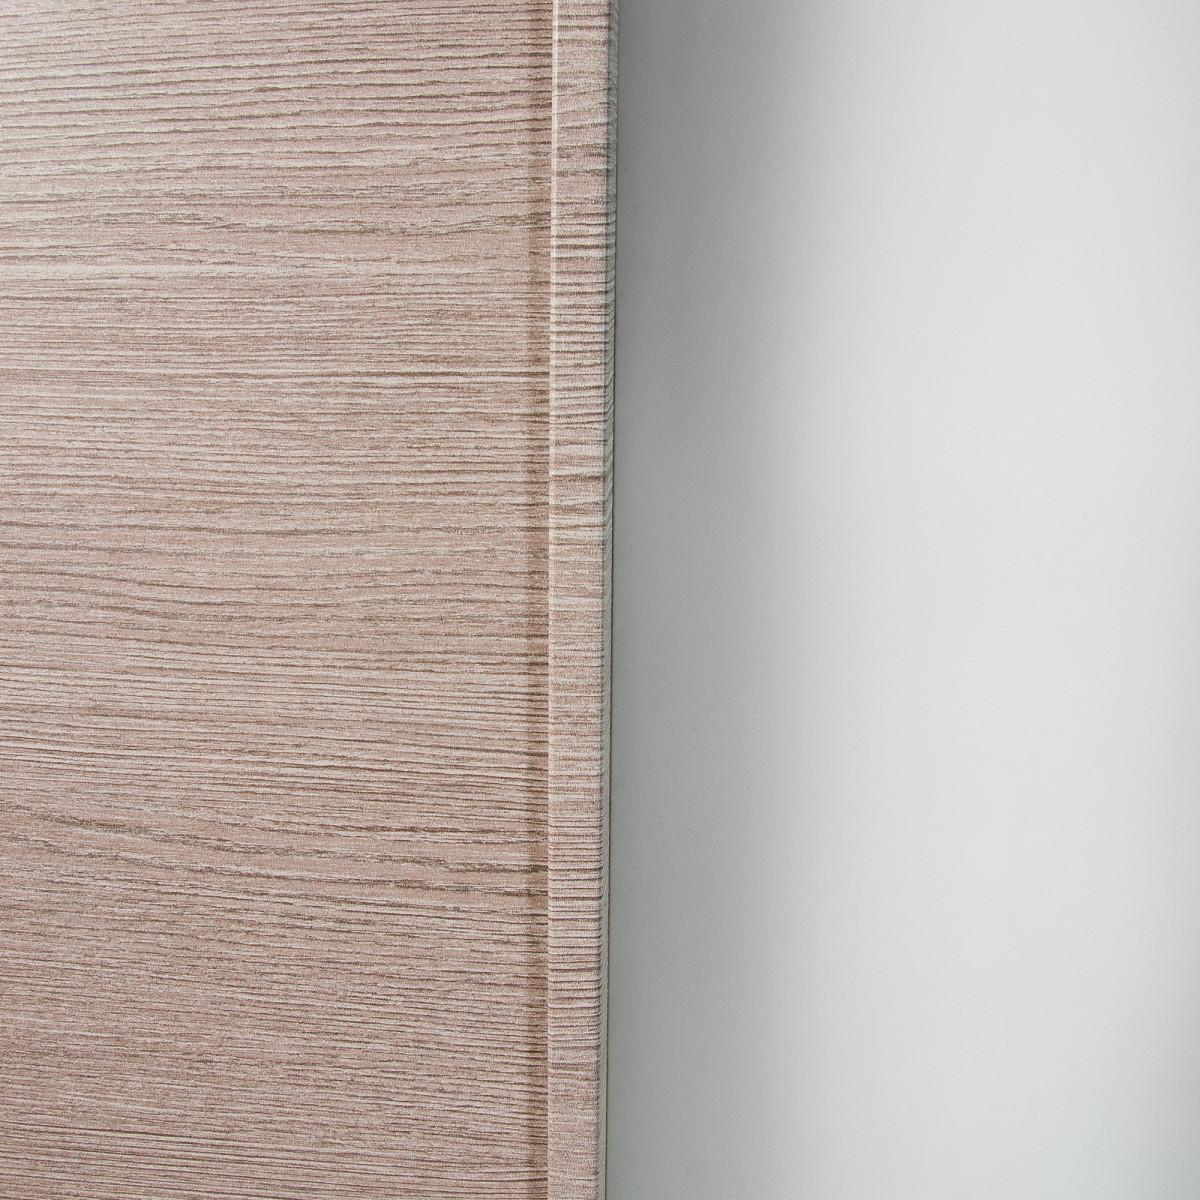 Дверь Межкомнатная Остеклённая 90x200 Ламинация Цвет Дуб Дымчатый